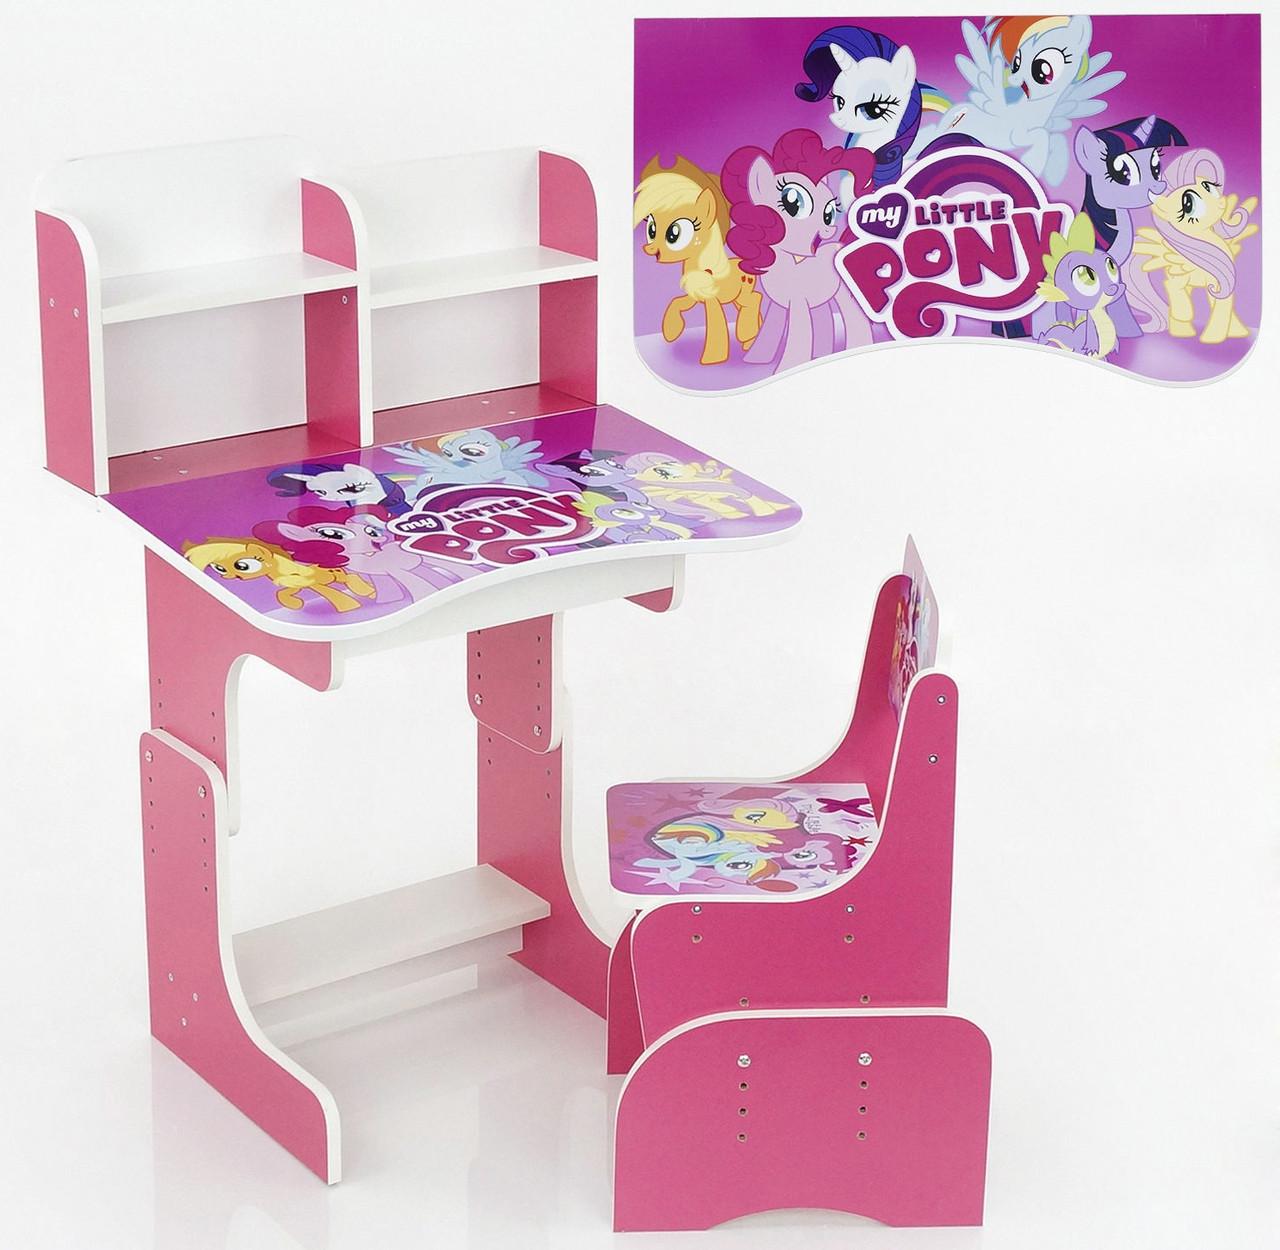 Парта растишка шкільна Pony 018 рожева